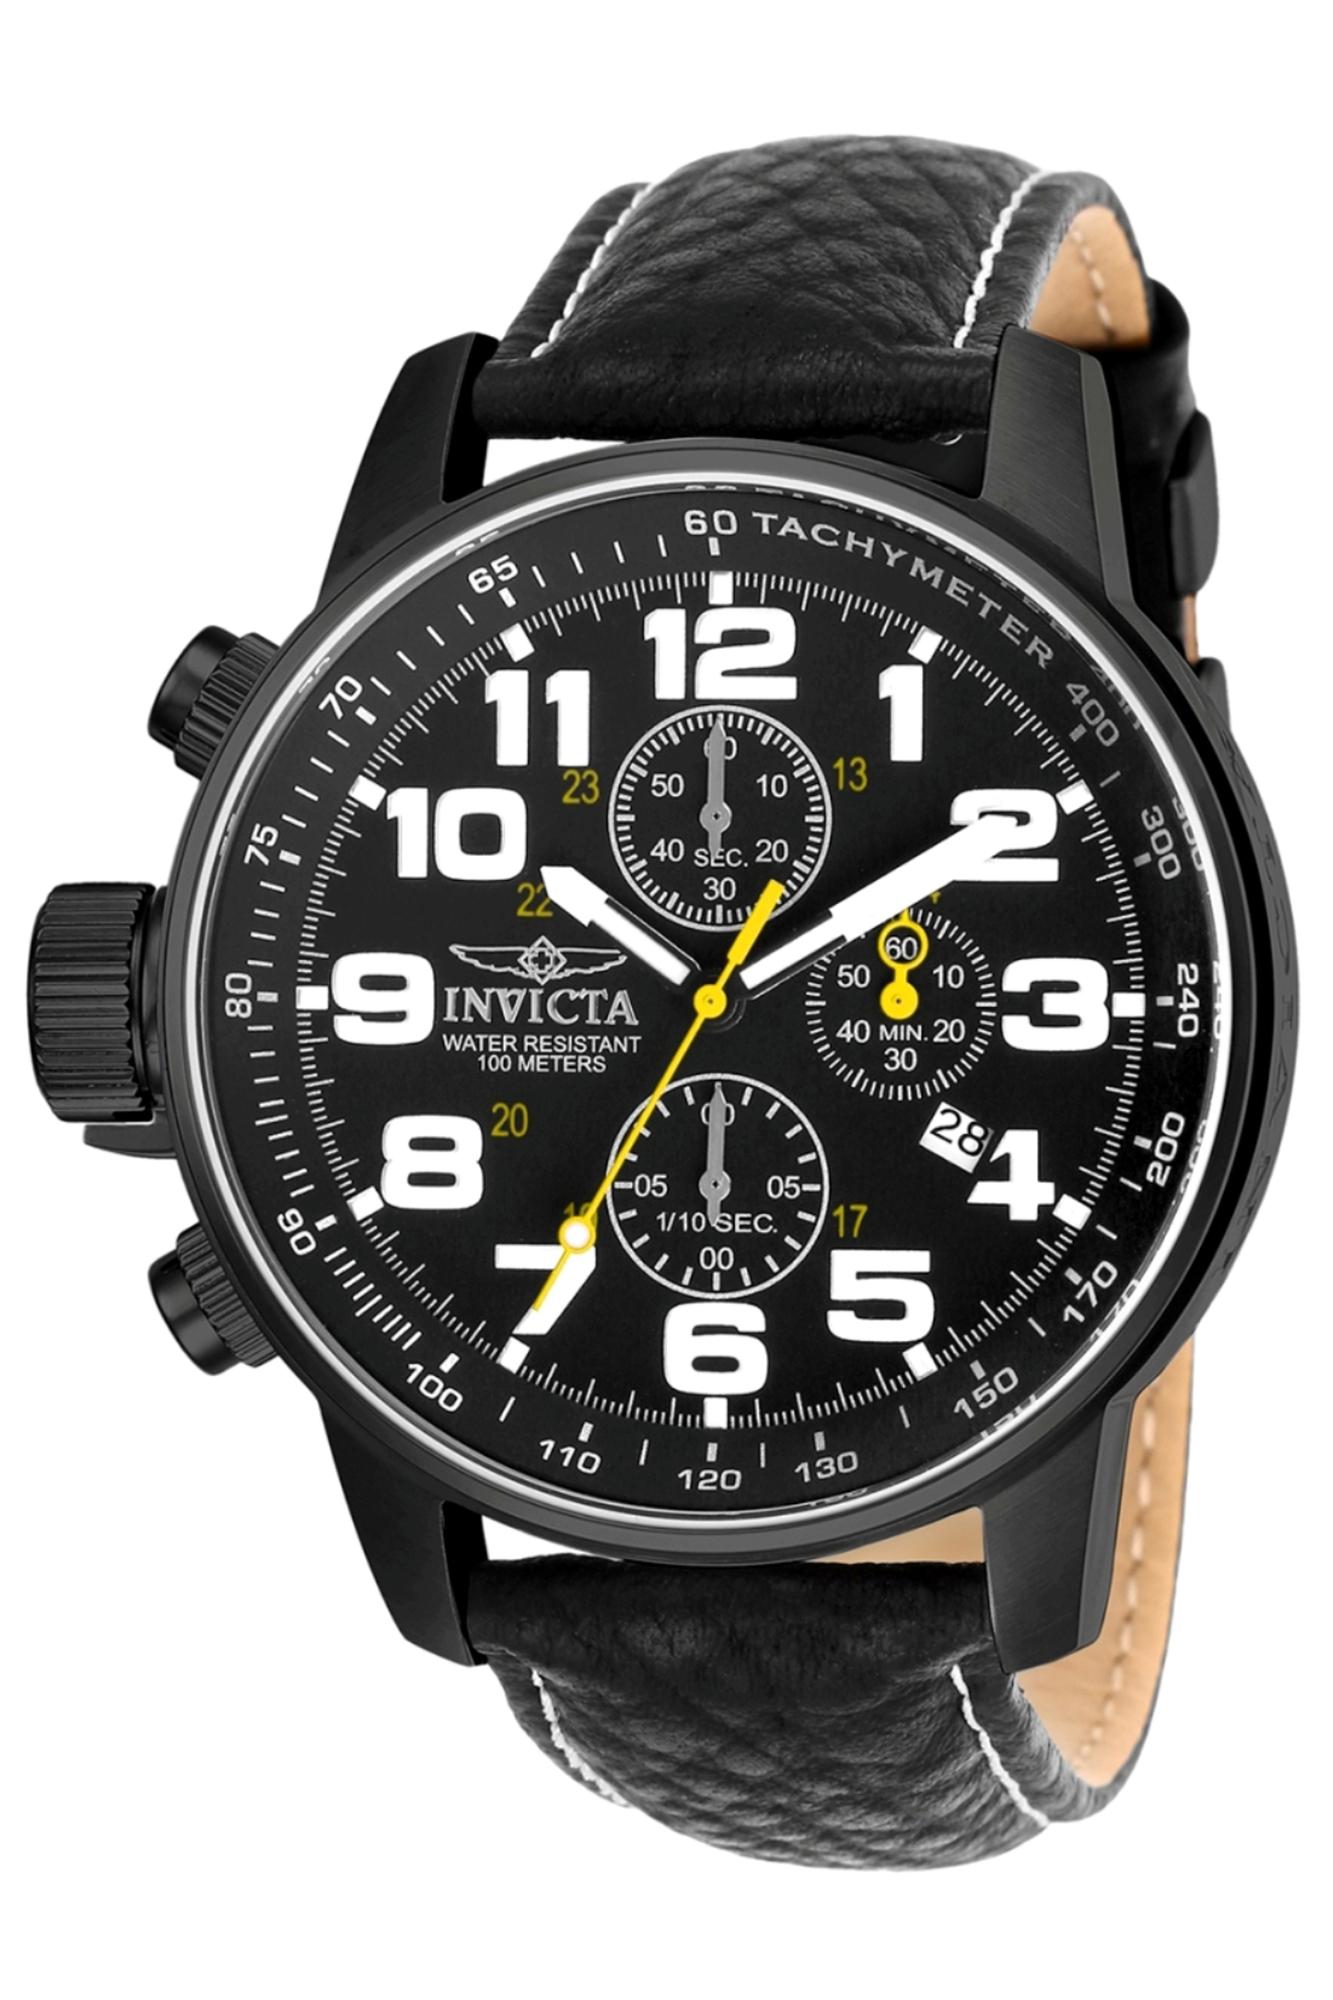 Invicta_Mens_3332_Black_Leather_Japanese_Chronograph_Sport_Watch